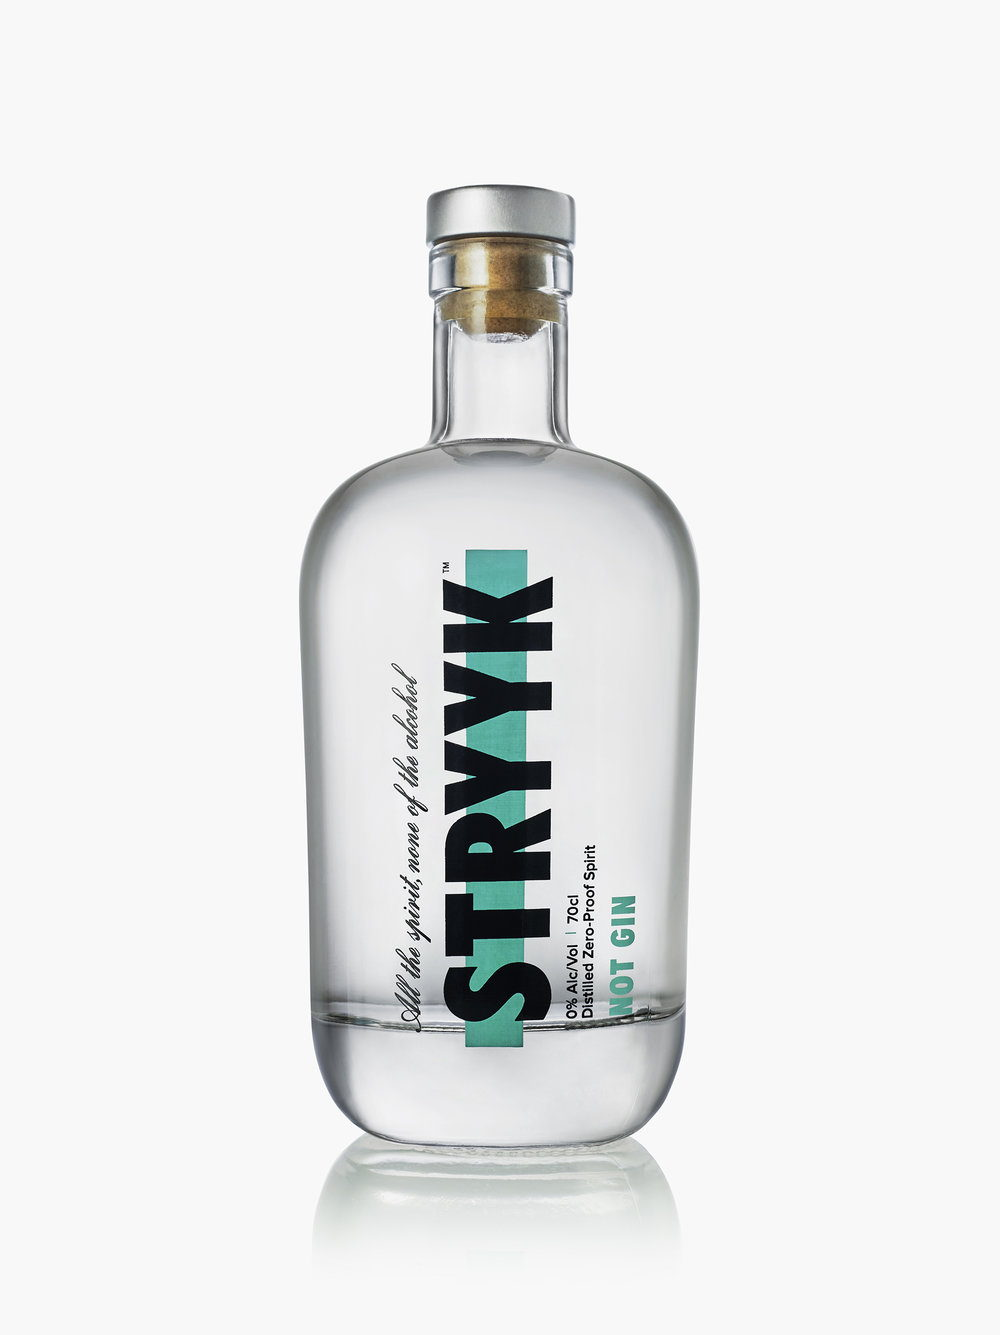 Stryyk_Not_Gin_bottle.jpg